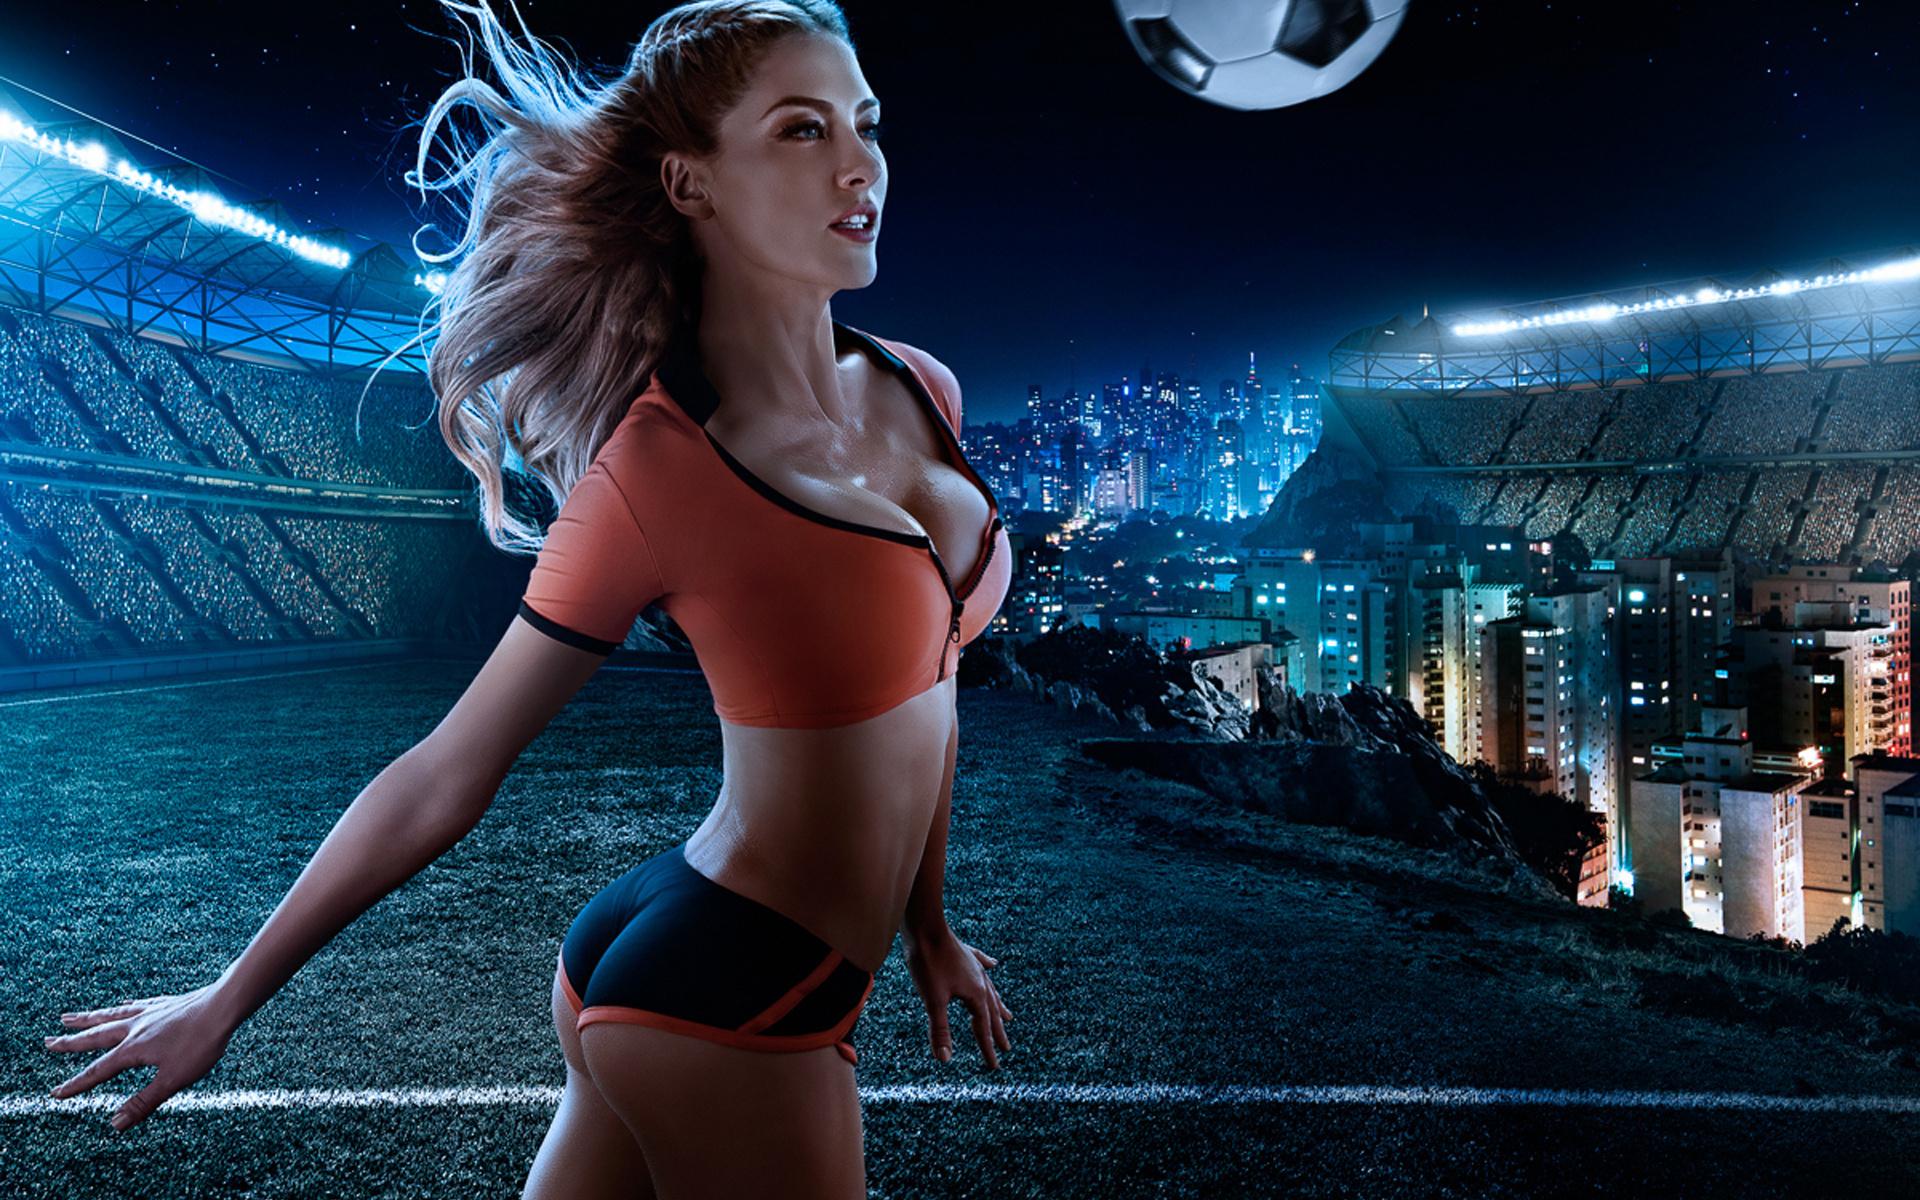 Фигура женщин футболисток 20 фотография